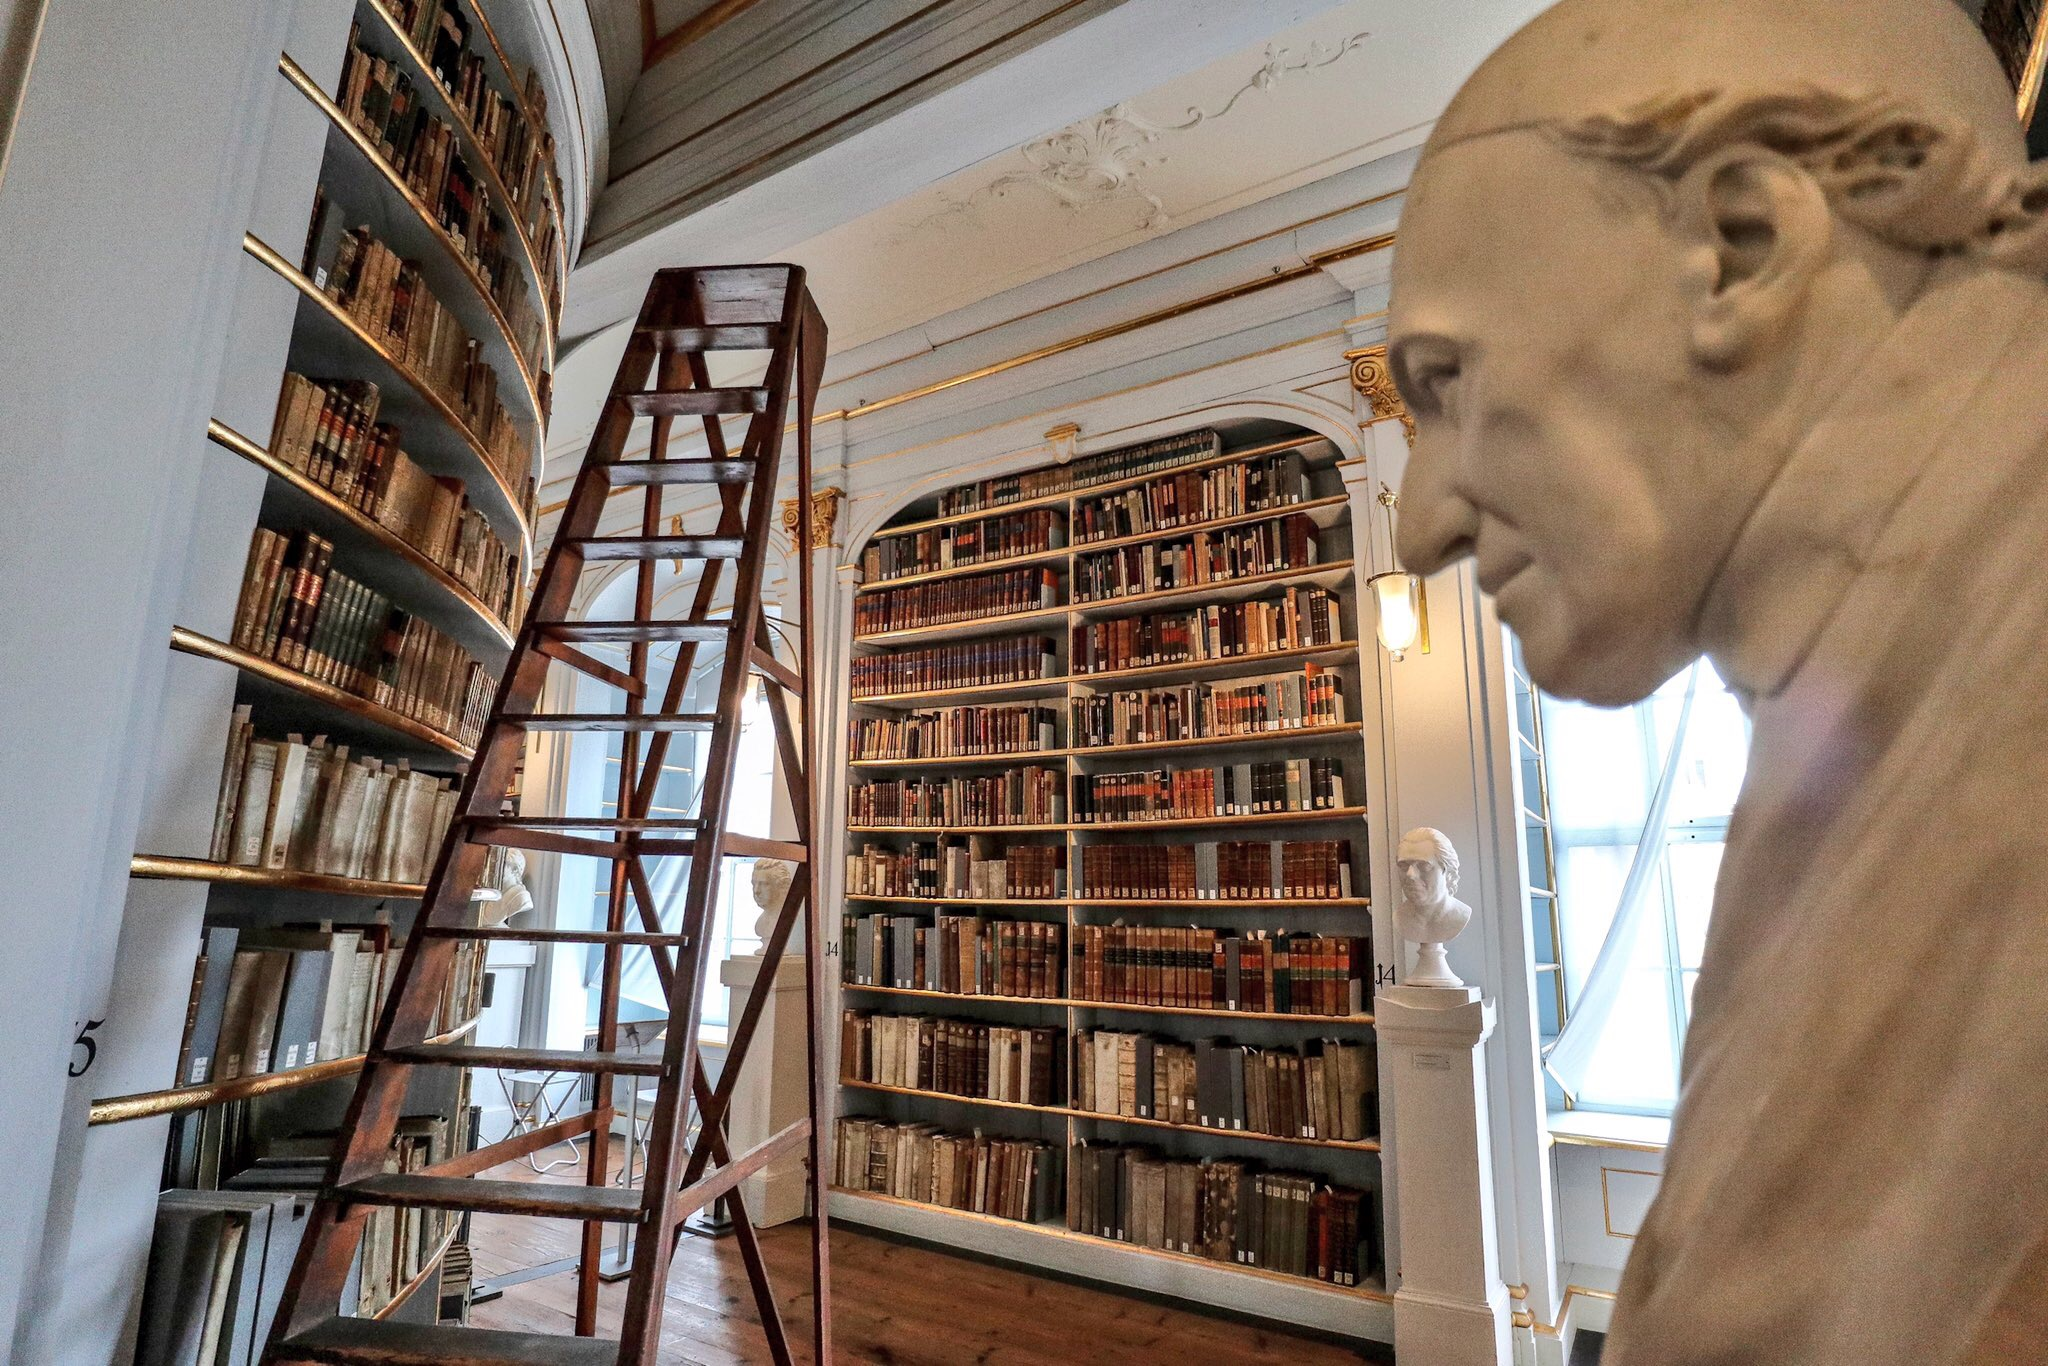 Duchess Anna Amalia Library in Weimar, Germany